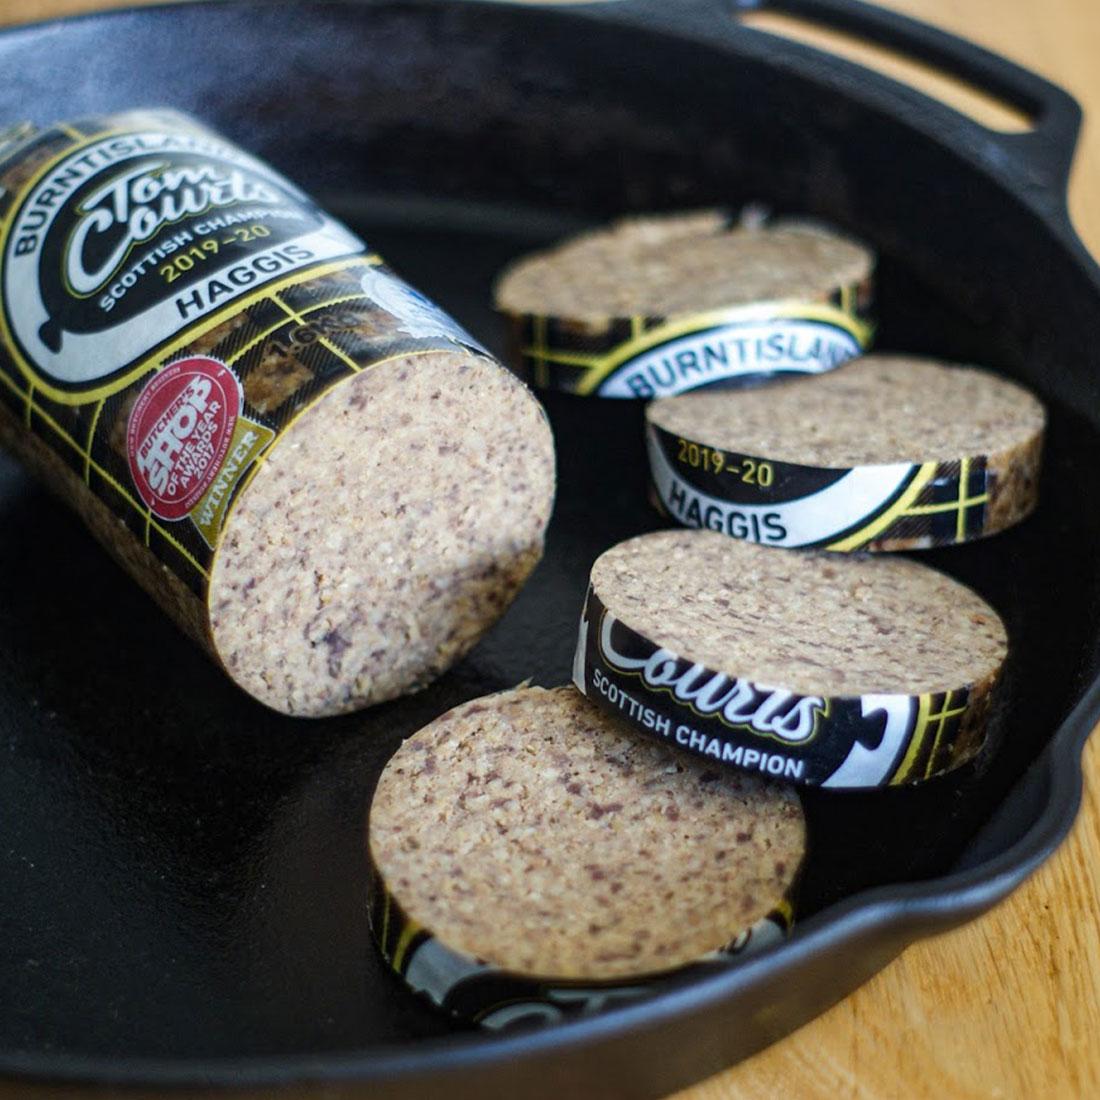 Haggis by Burntisland Haggis